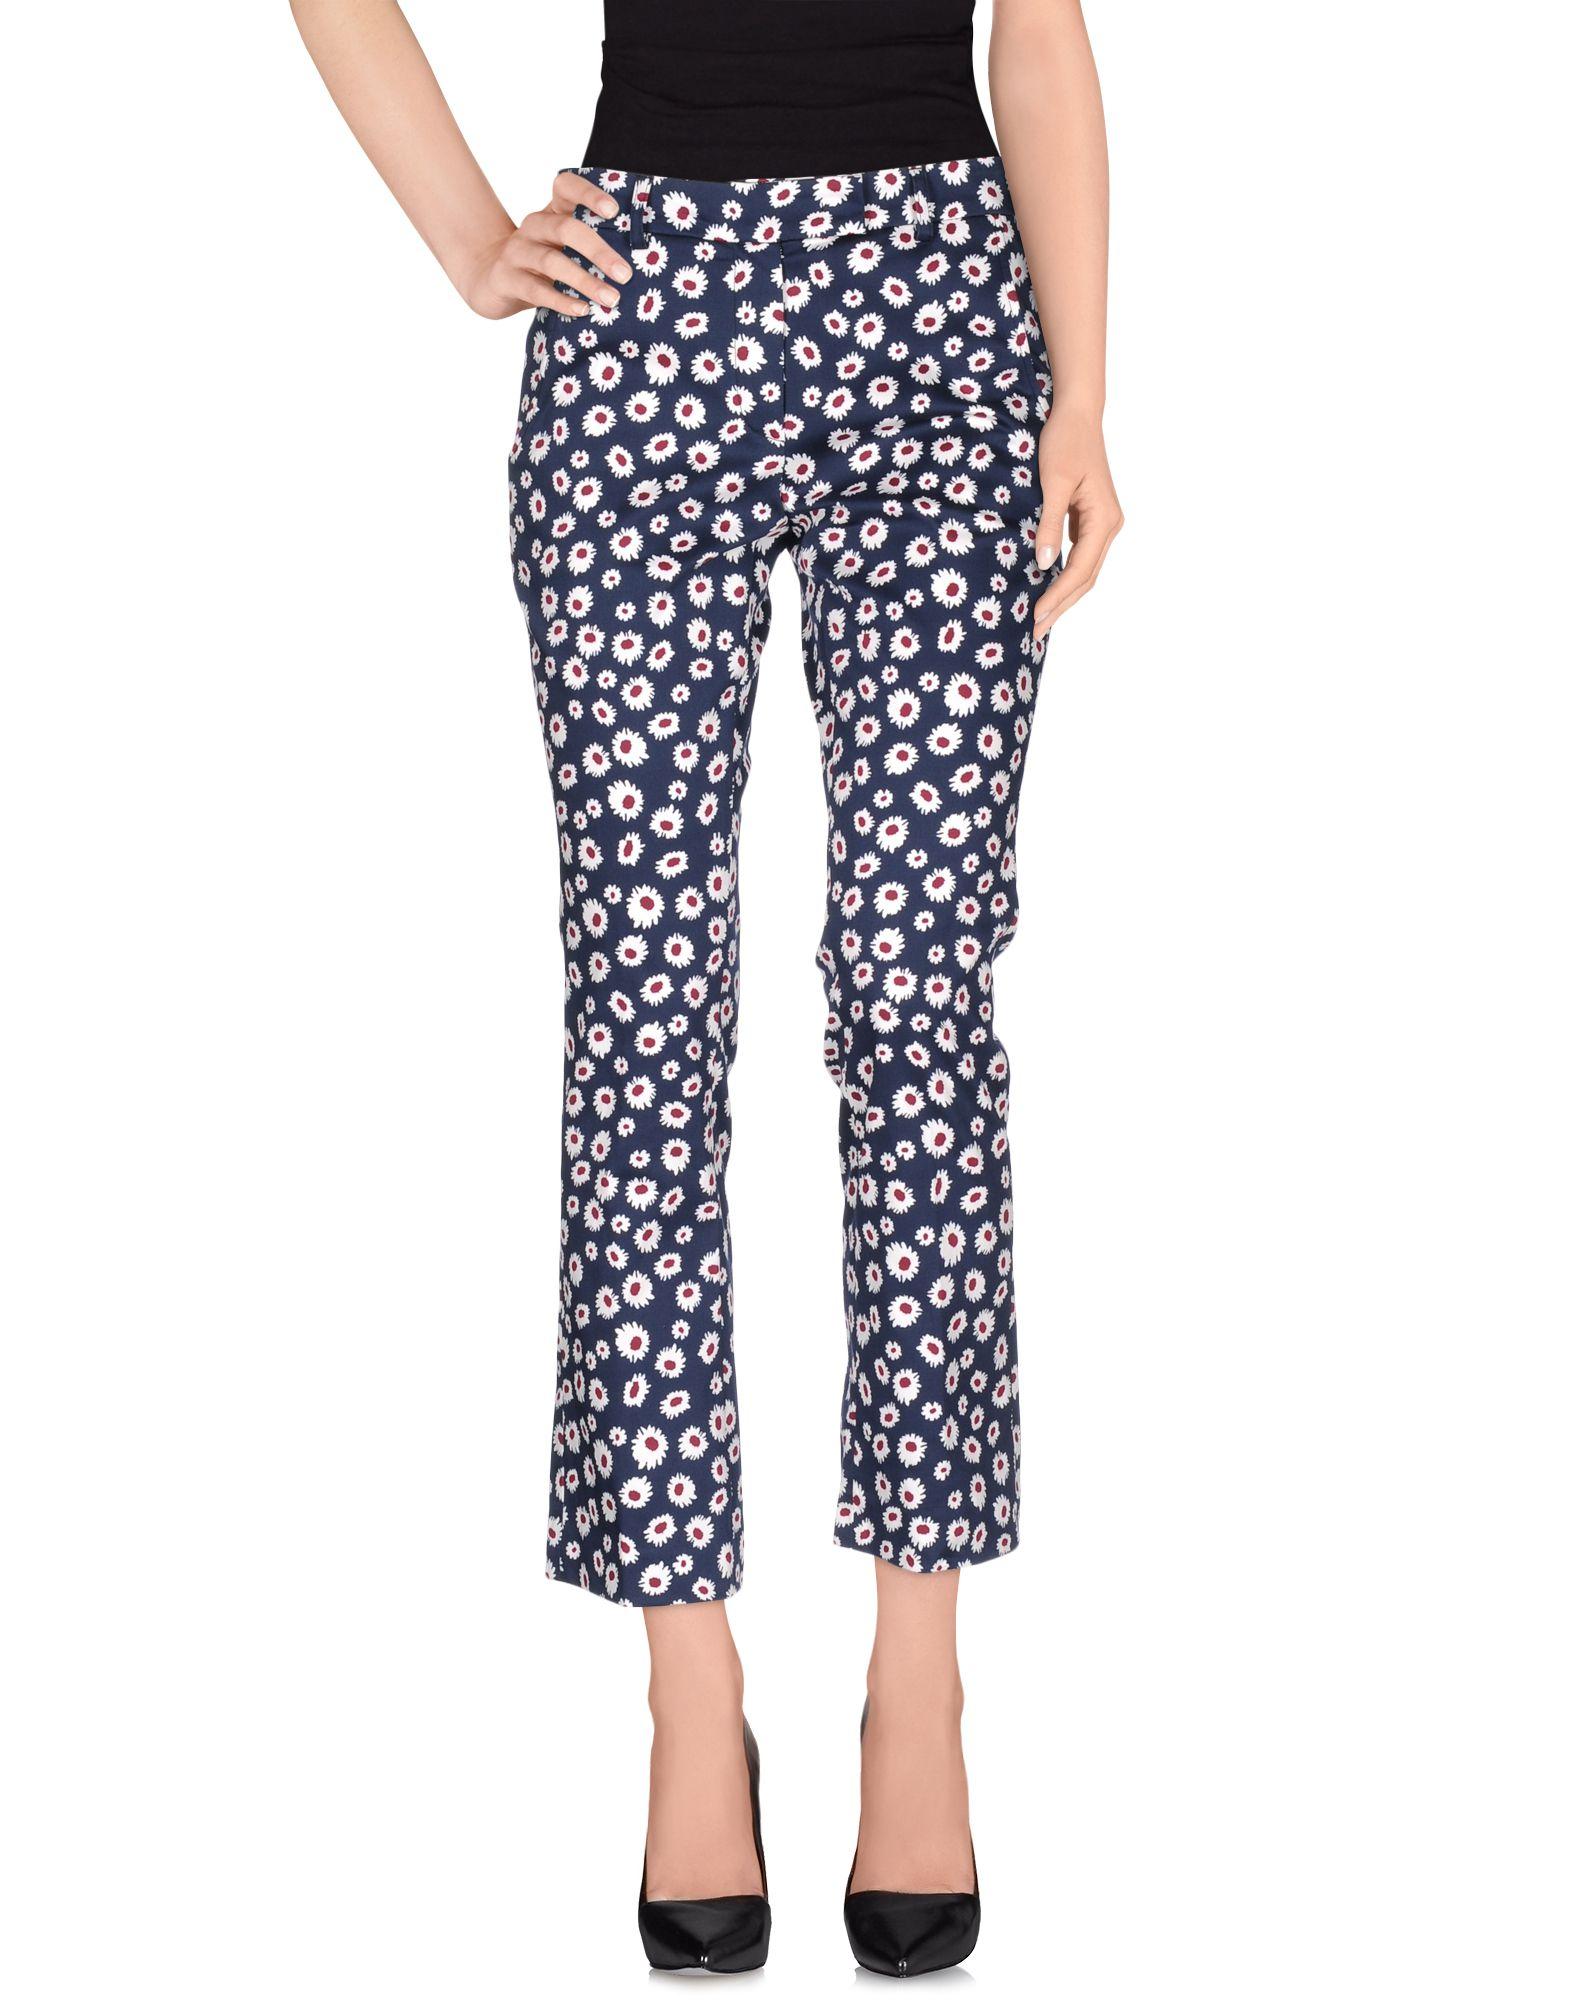 INCOTEX Damen Hose Farbe Dunkelblau Größe 6